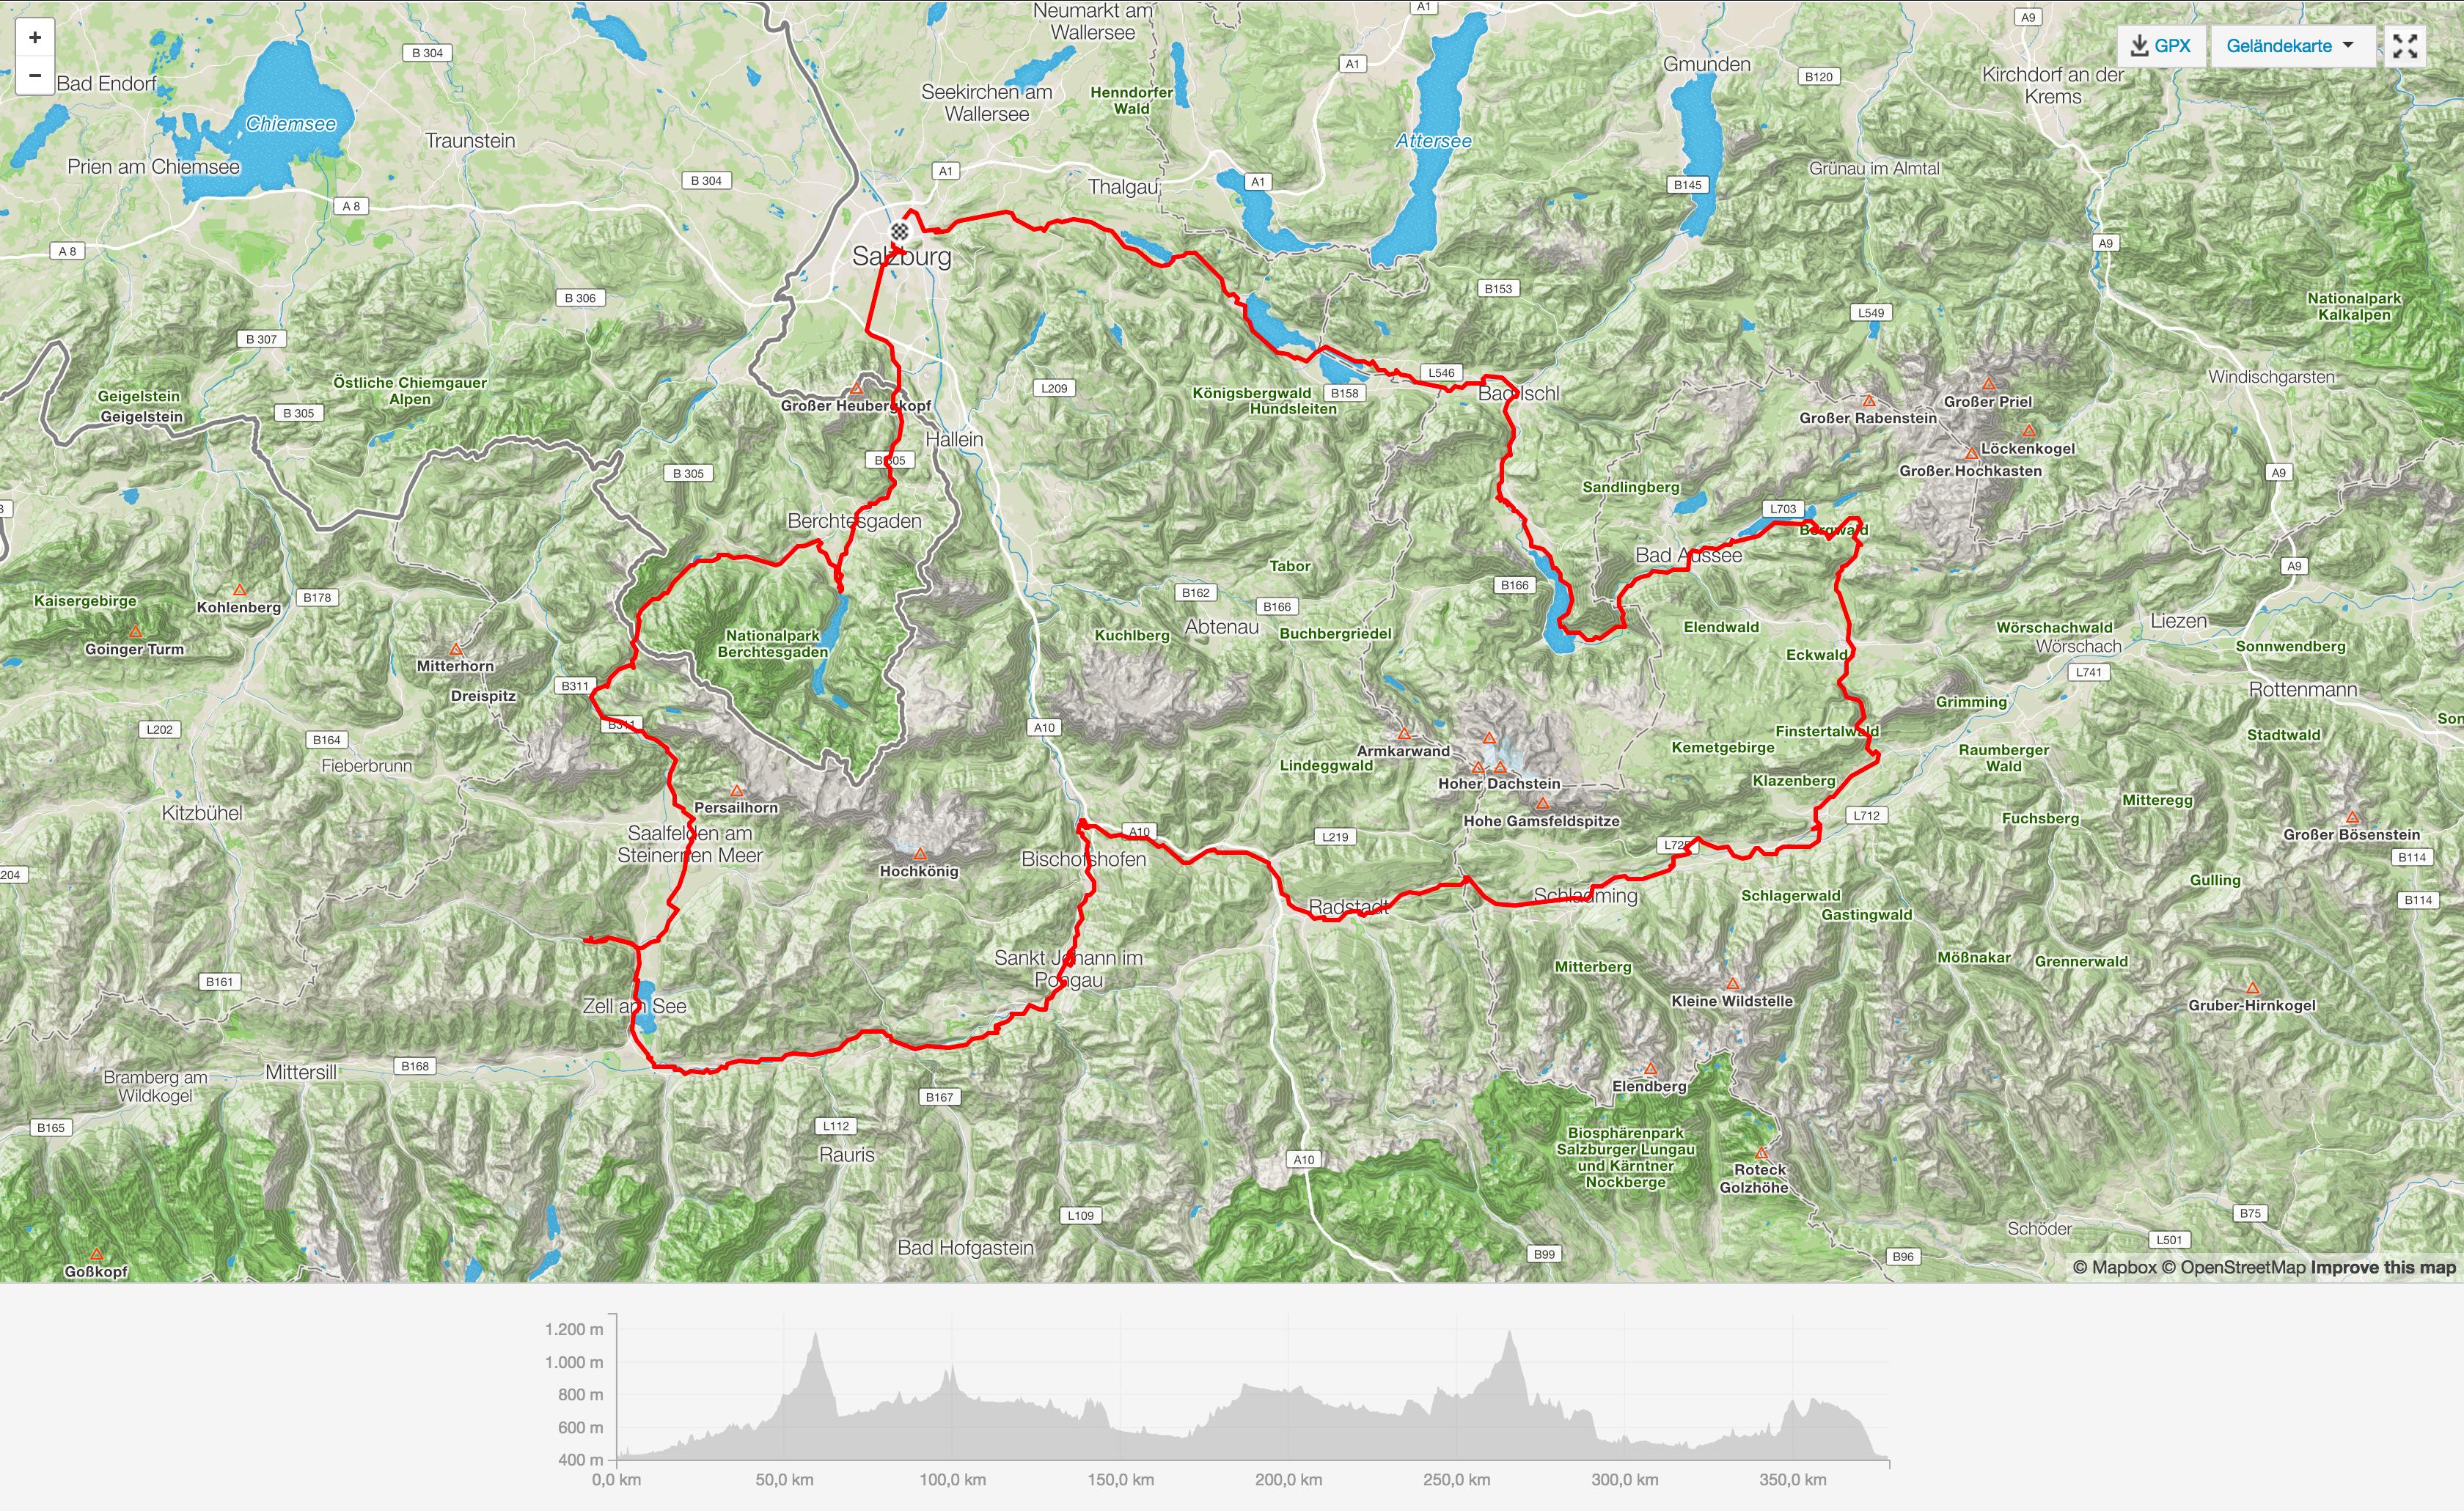 Salzburger Kreisel 2017 Strava